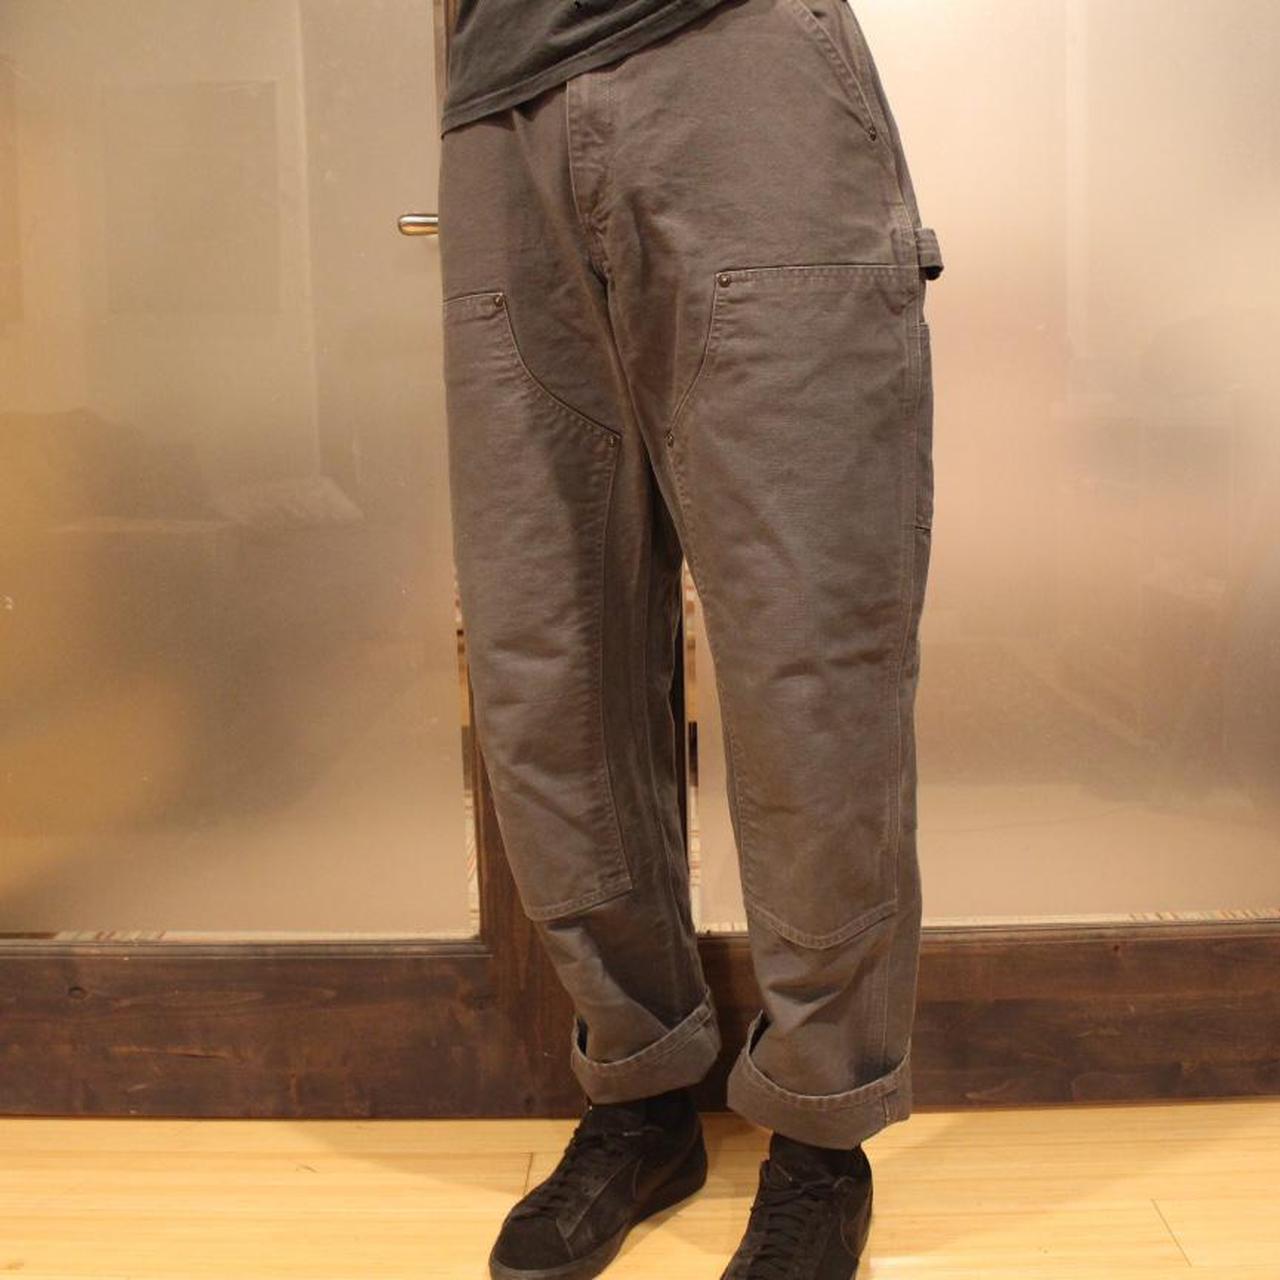 Product Image 1 - Carhartt double knee carpenter pants